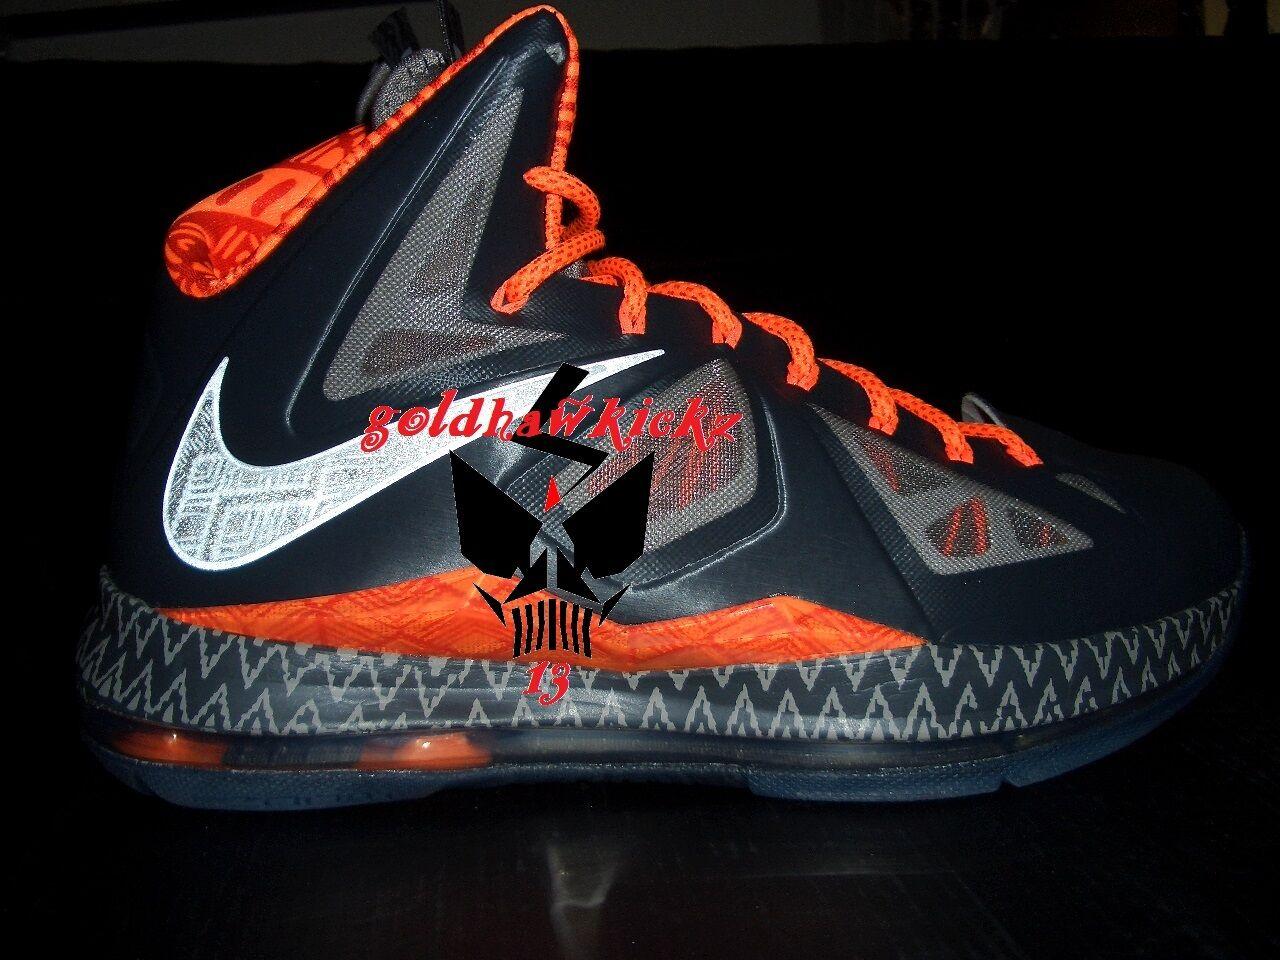 Nike LeBron x 10 BHM el mes de la Star historia negra Galaxy All Star la area 72 el modelo mas vendido de la marca 224e95